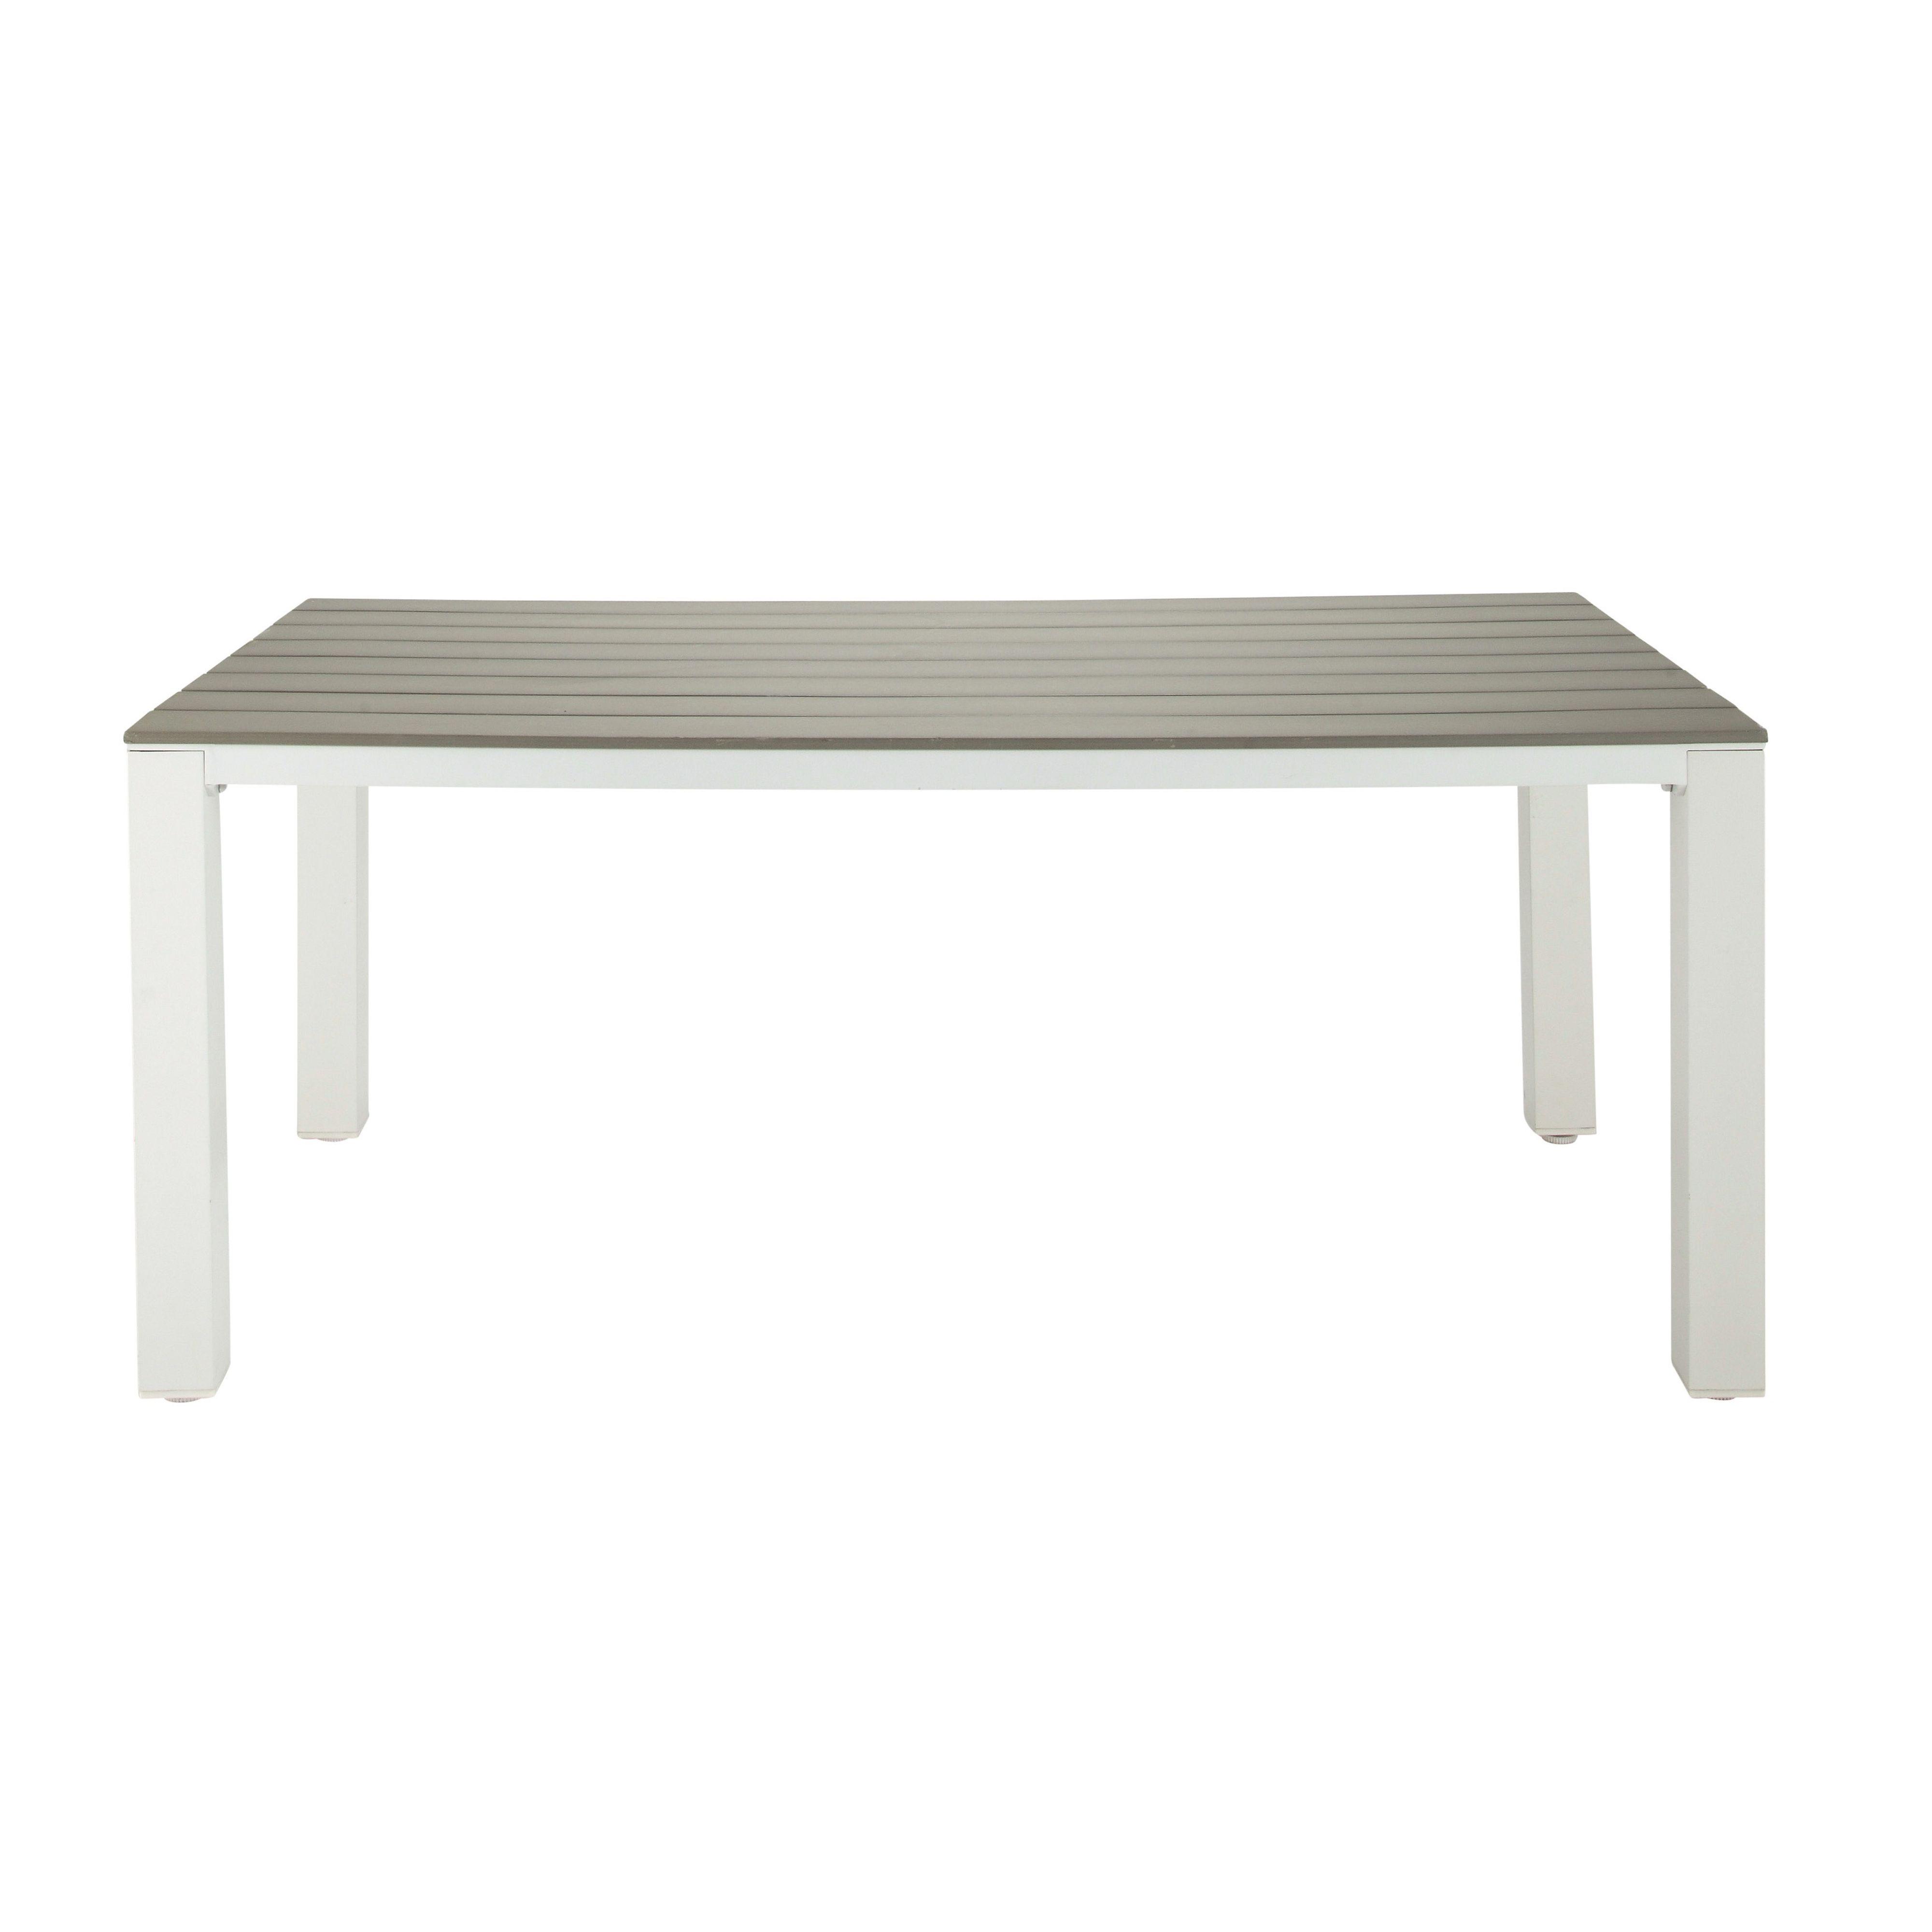 Aluminium En Composiet Tuintafel 6 Personen L180 Table De Jardin